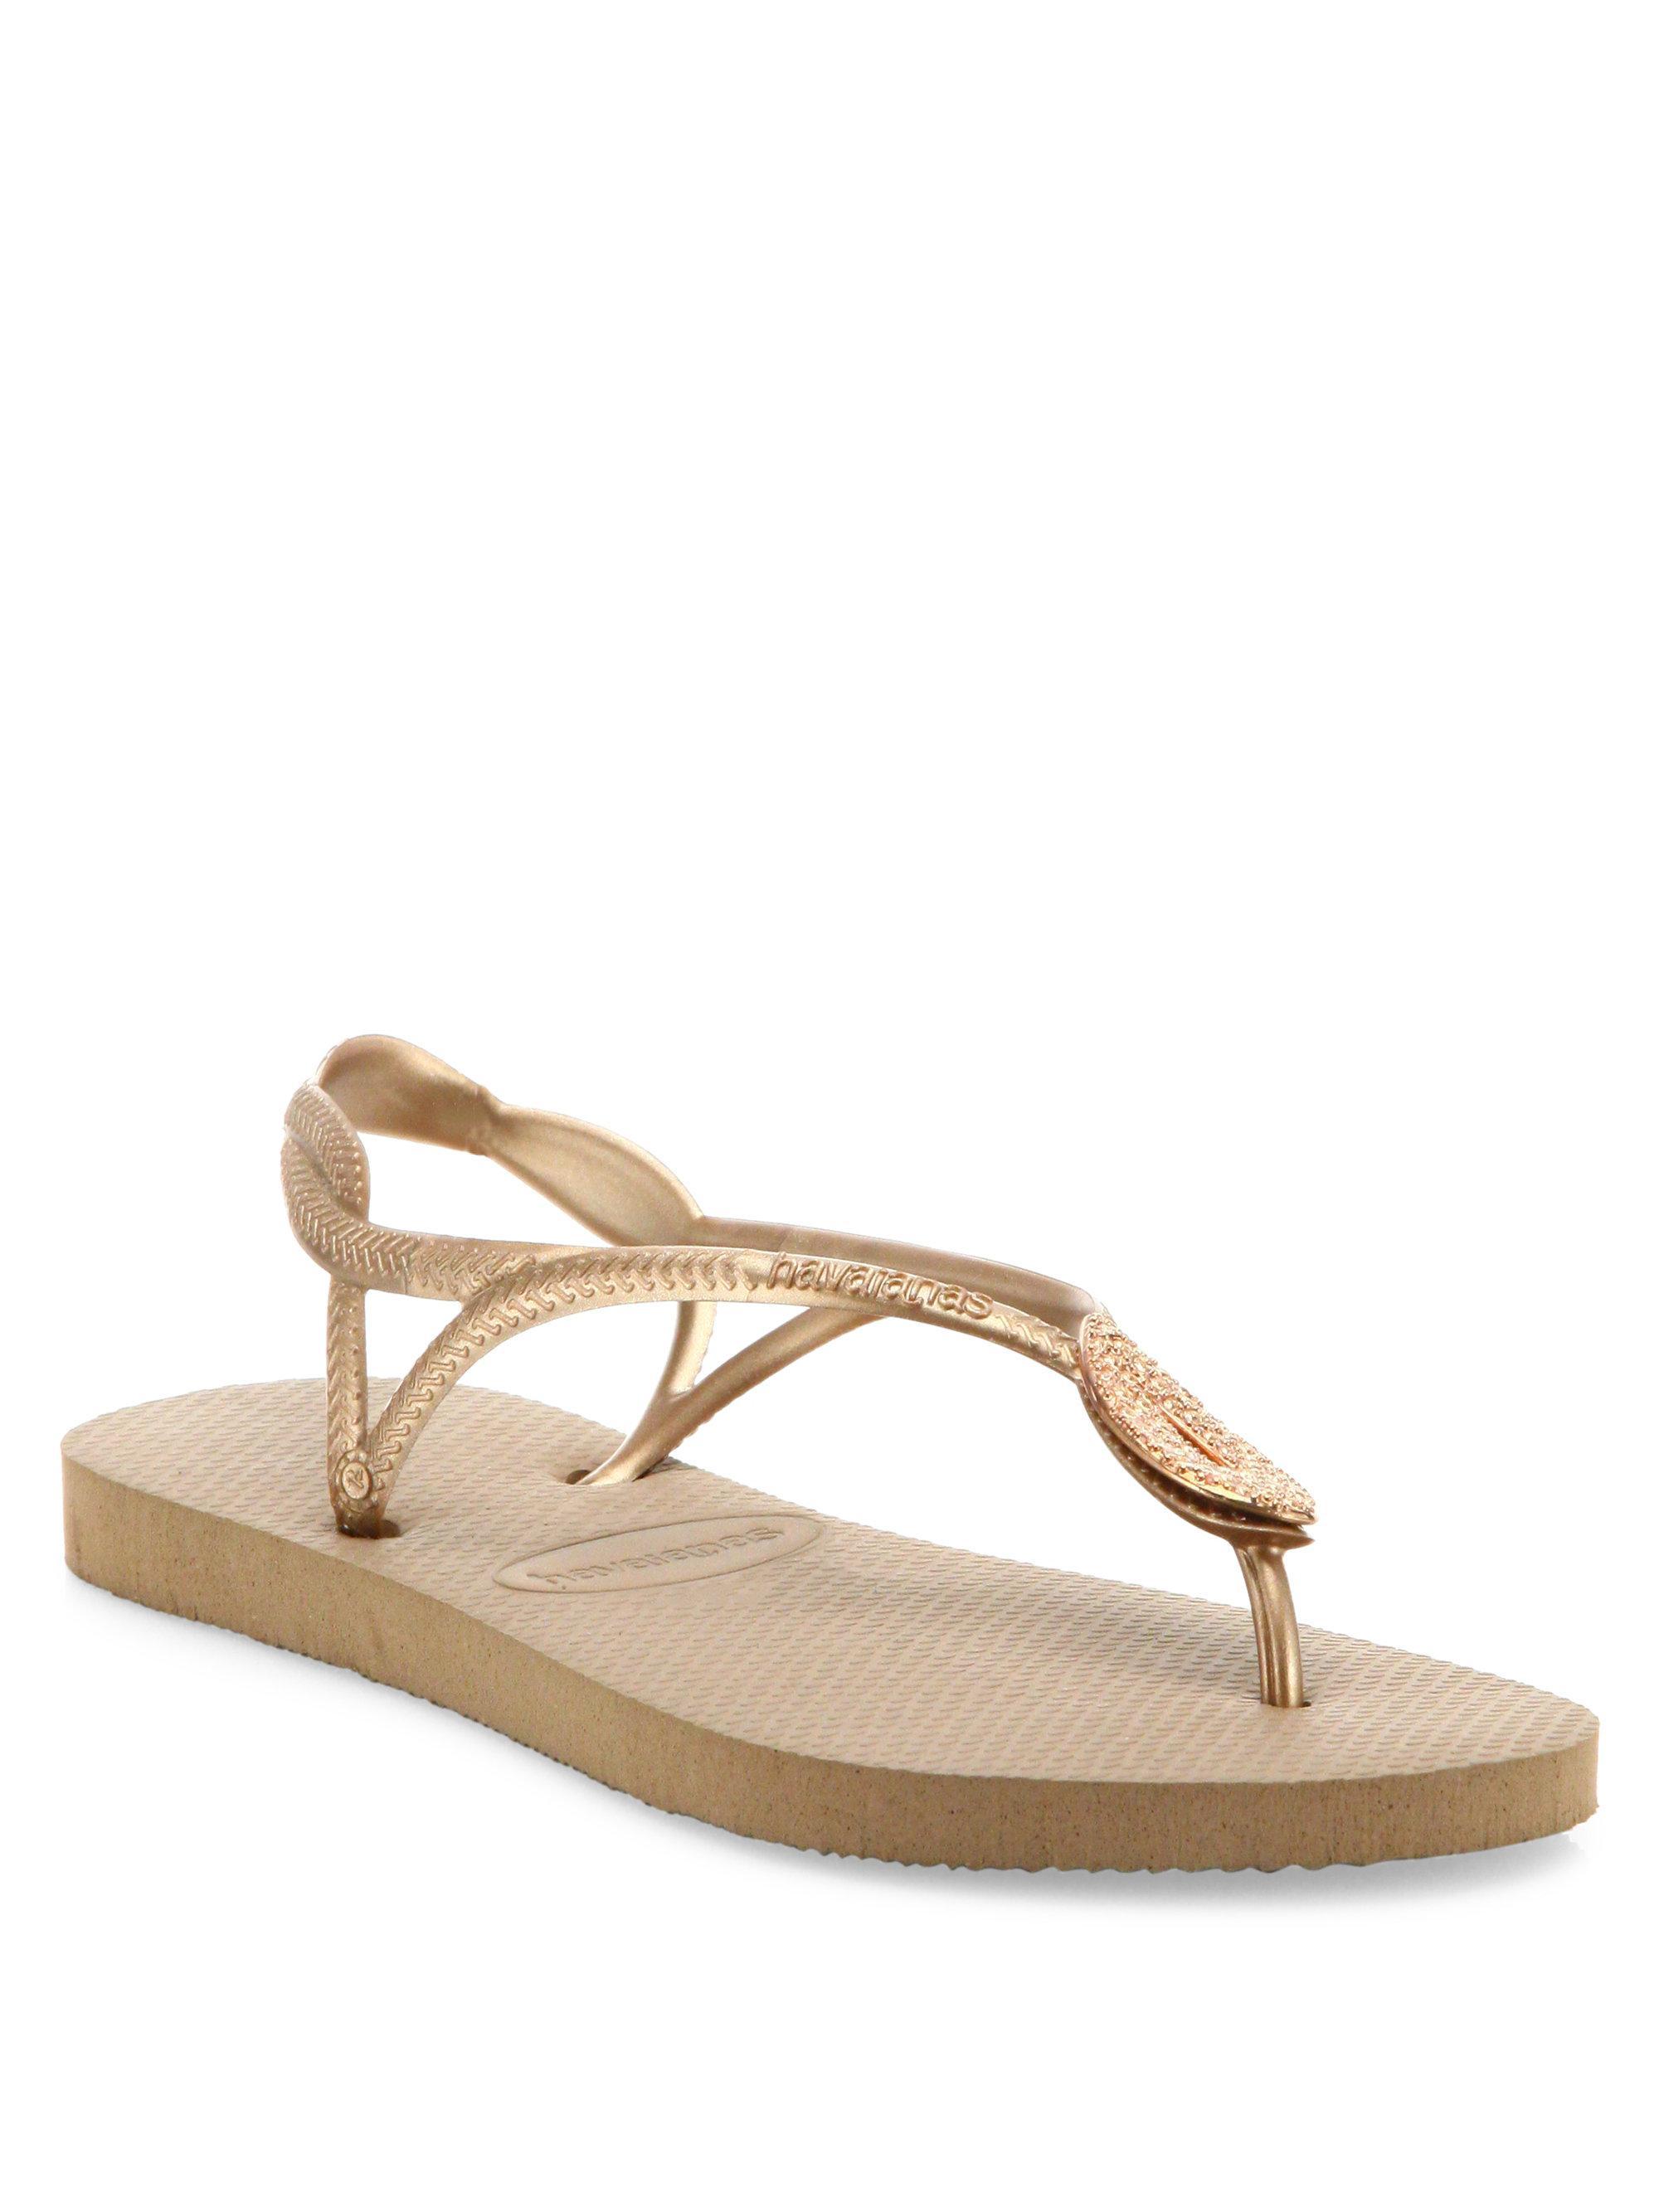 c4c511c19250 Lyst - Havaianas Luna Special Metallic Rubber Sandals in Metallic